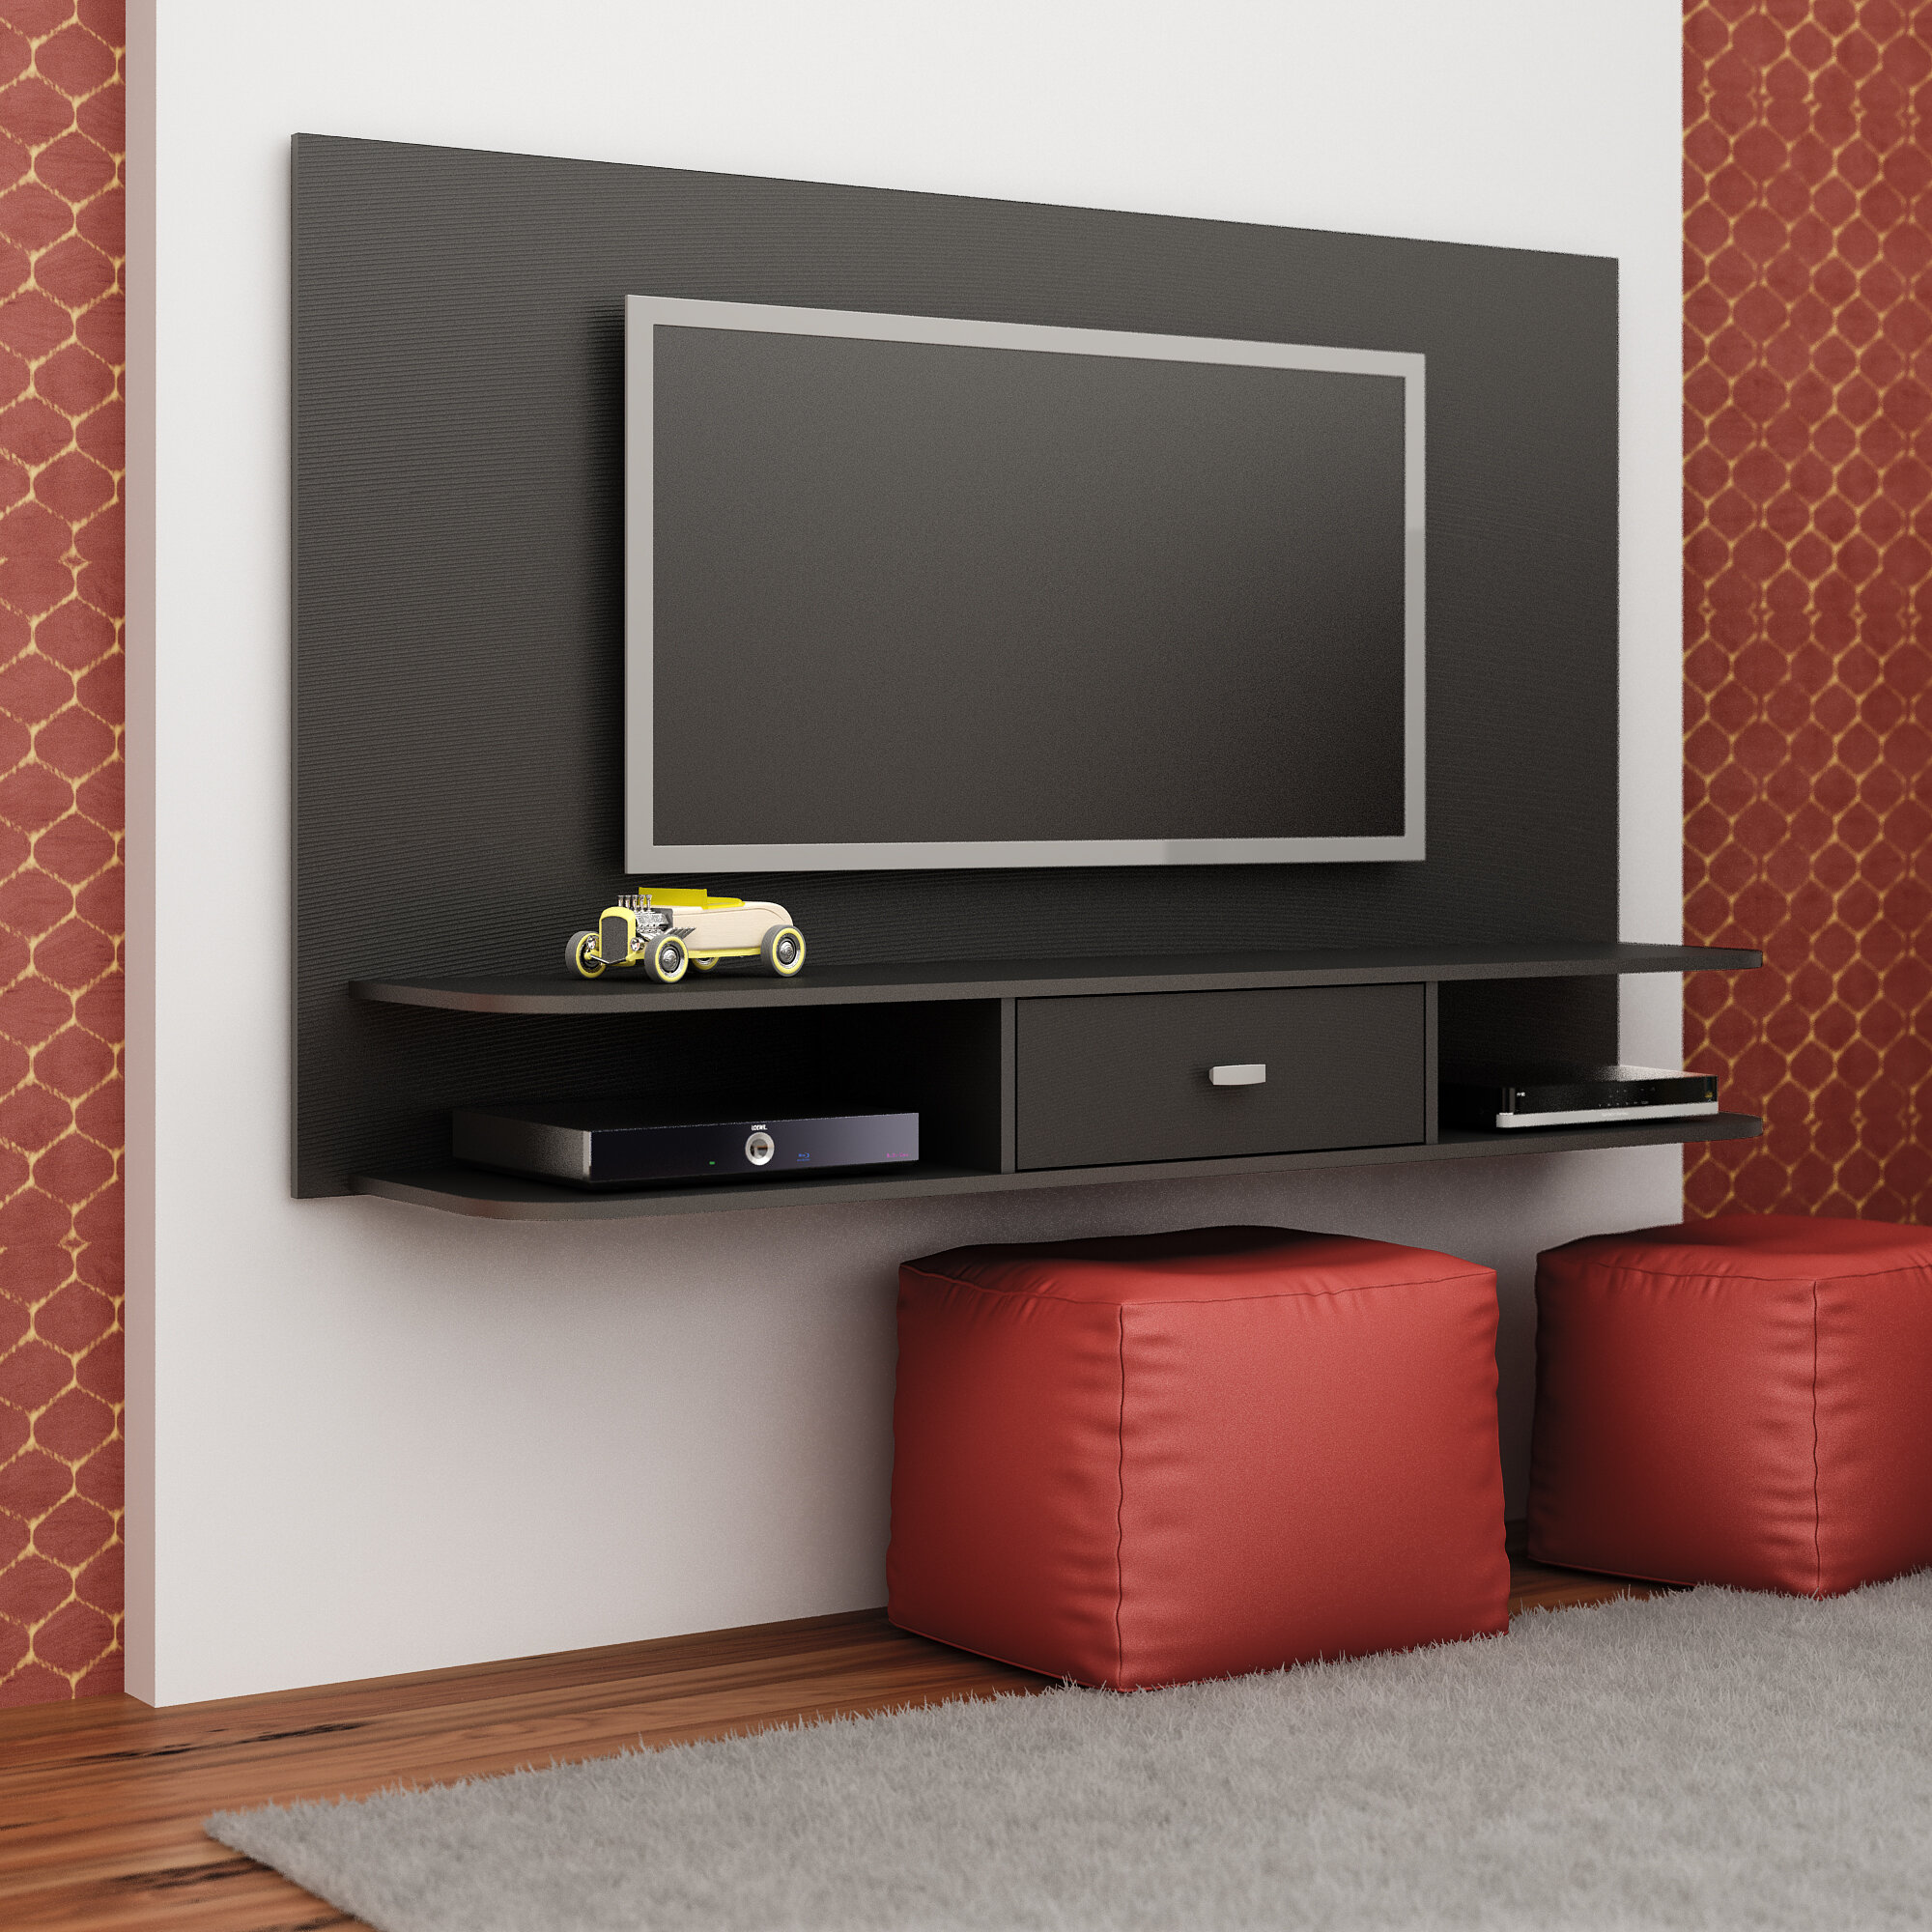 Zipcode Design Adelaida Floating Tv Stand For Tvs Up To 55 Reviews Wayfair